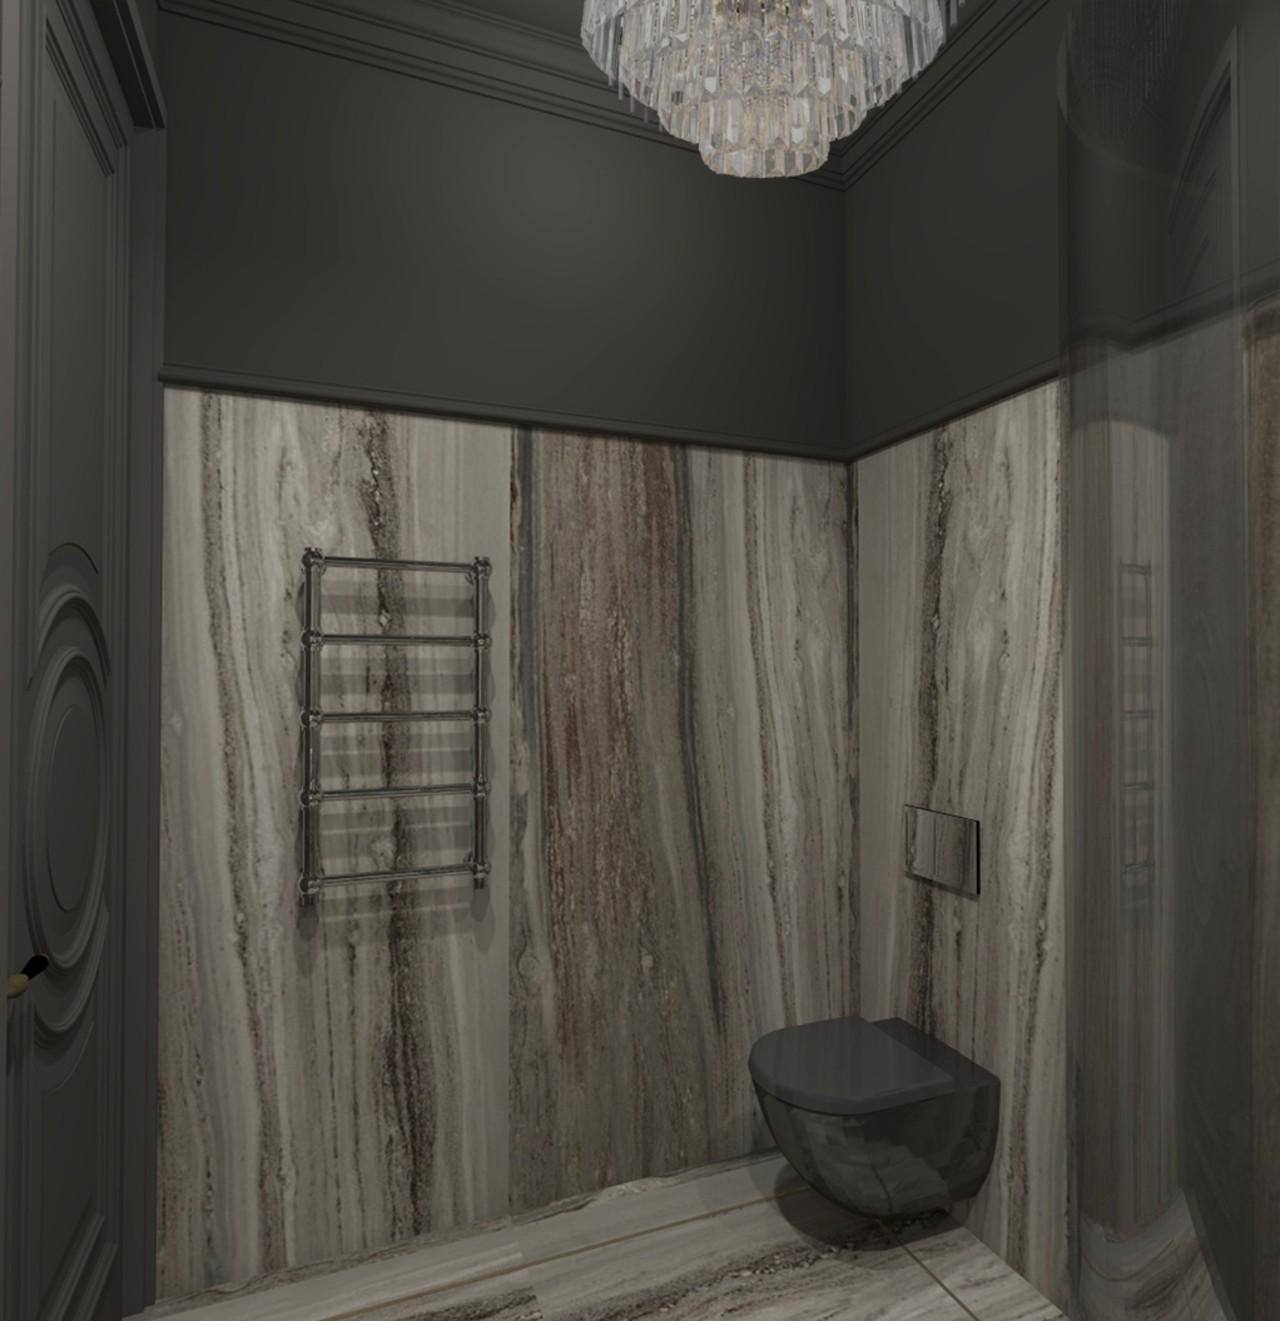 Rūsio interjeras su vonia